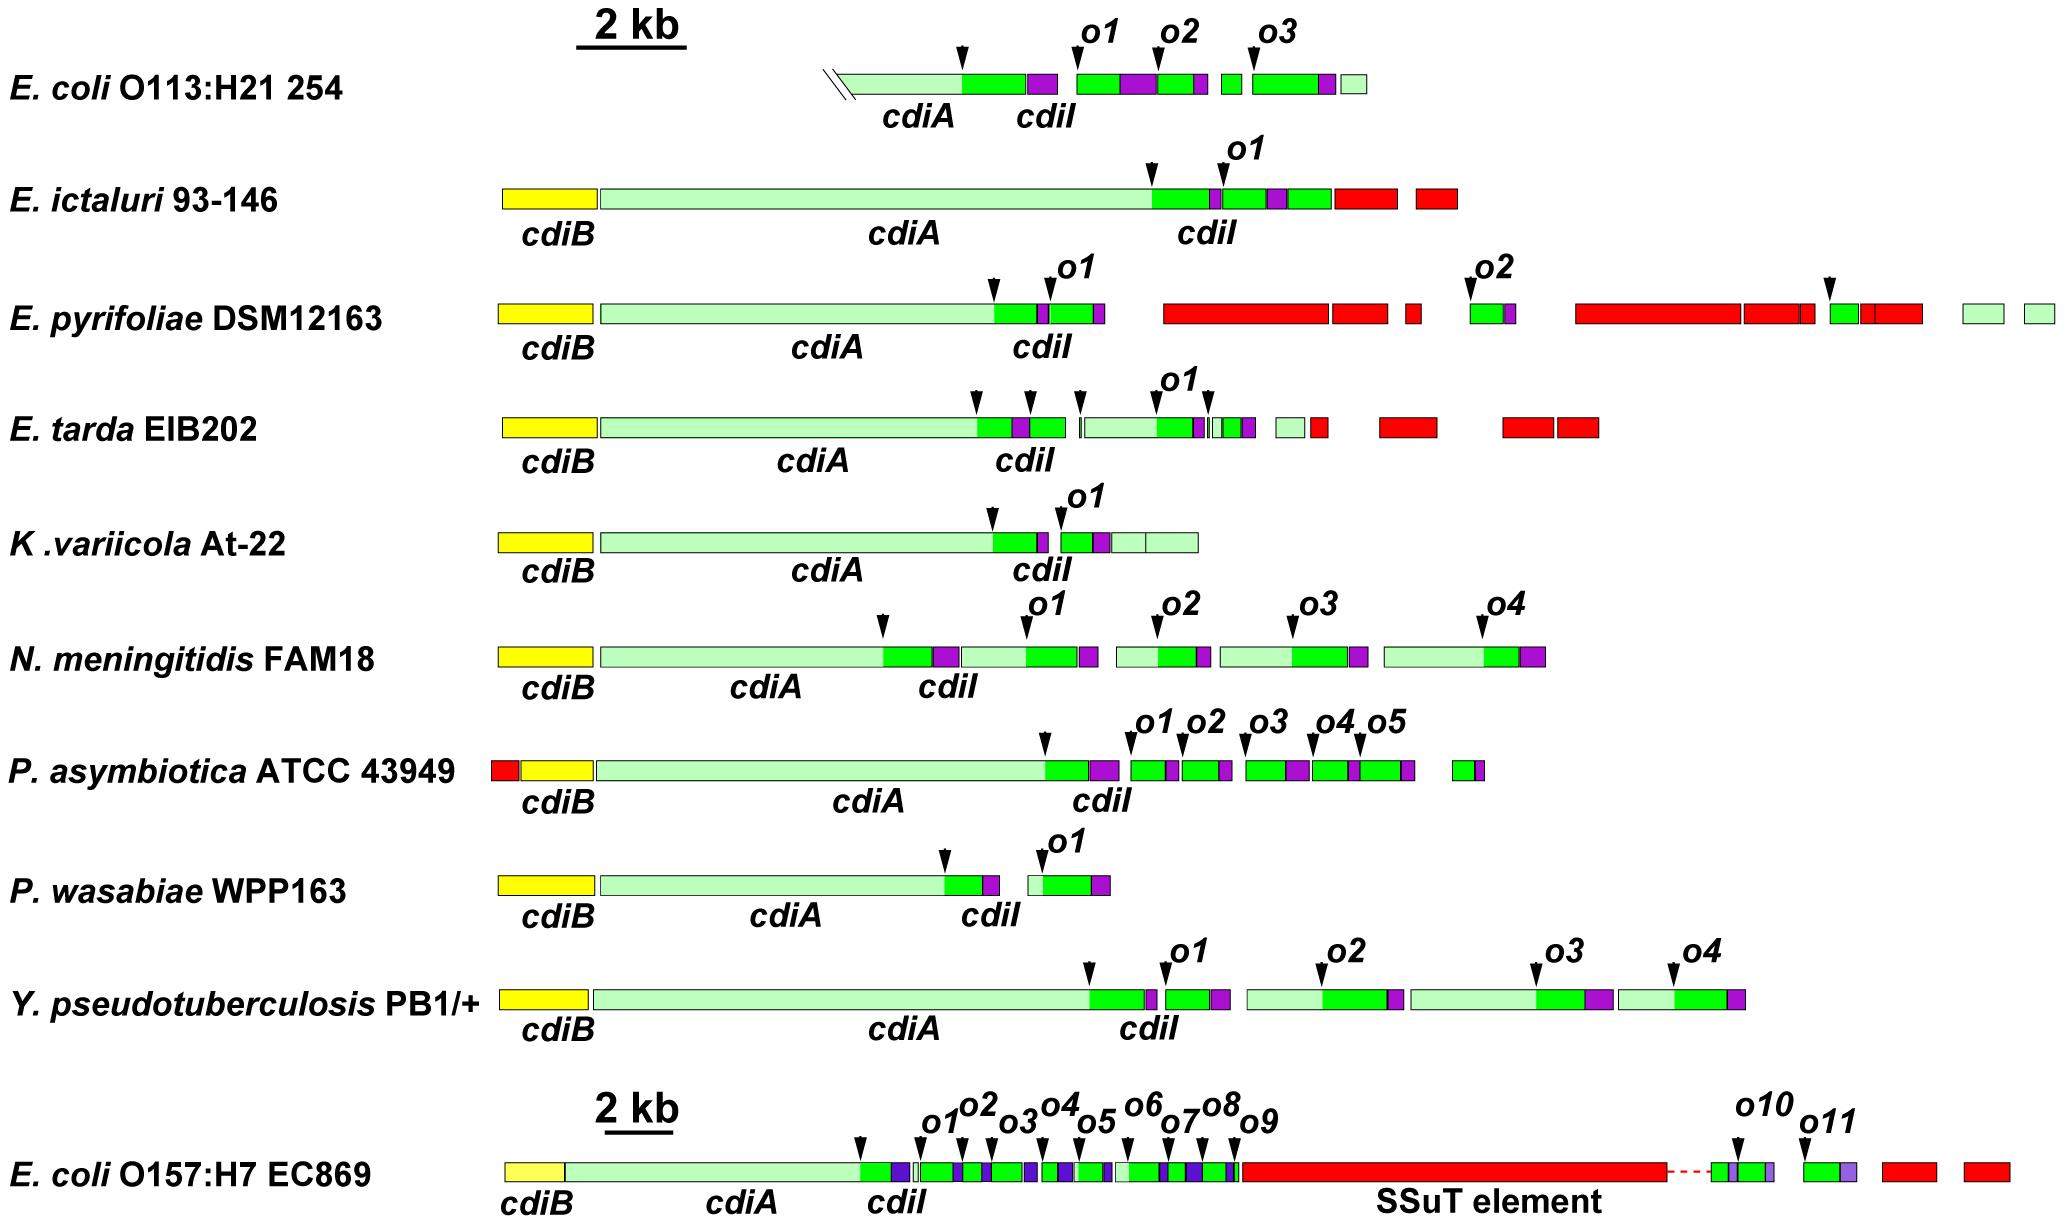 Many bacteria contain orphan <i>cdiA-CT/cdiI</i> modules.